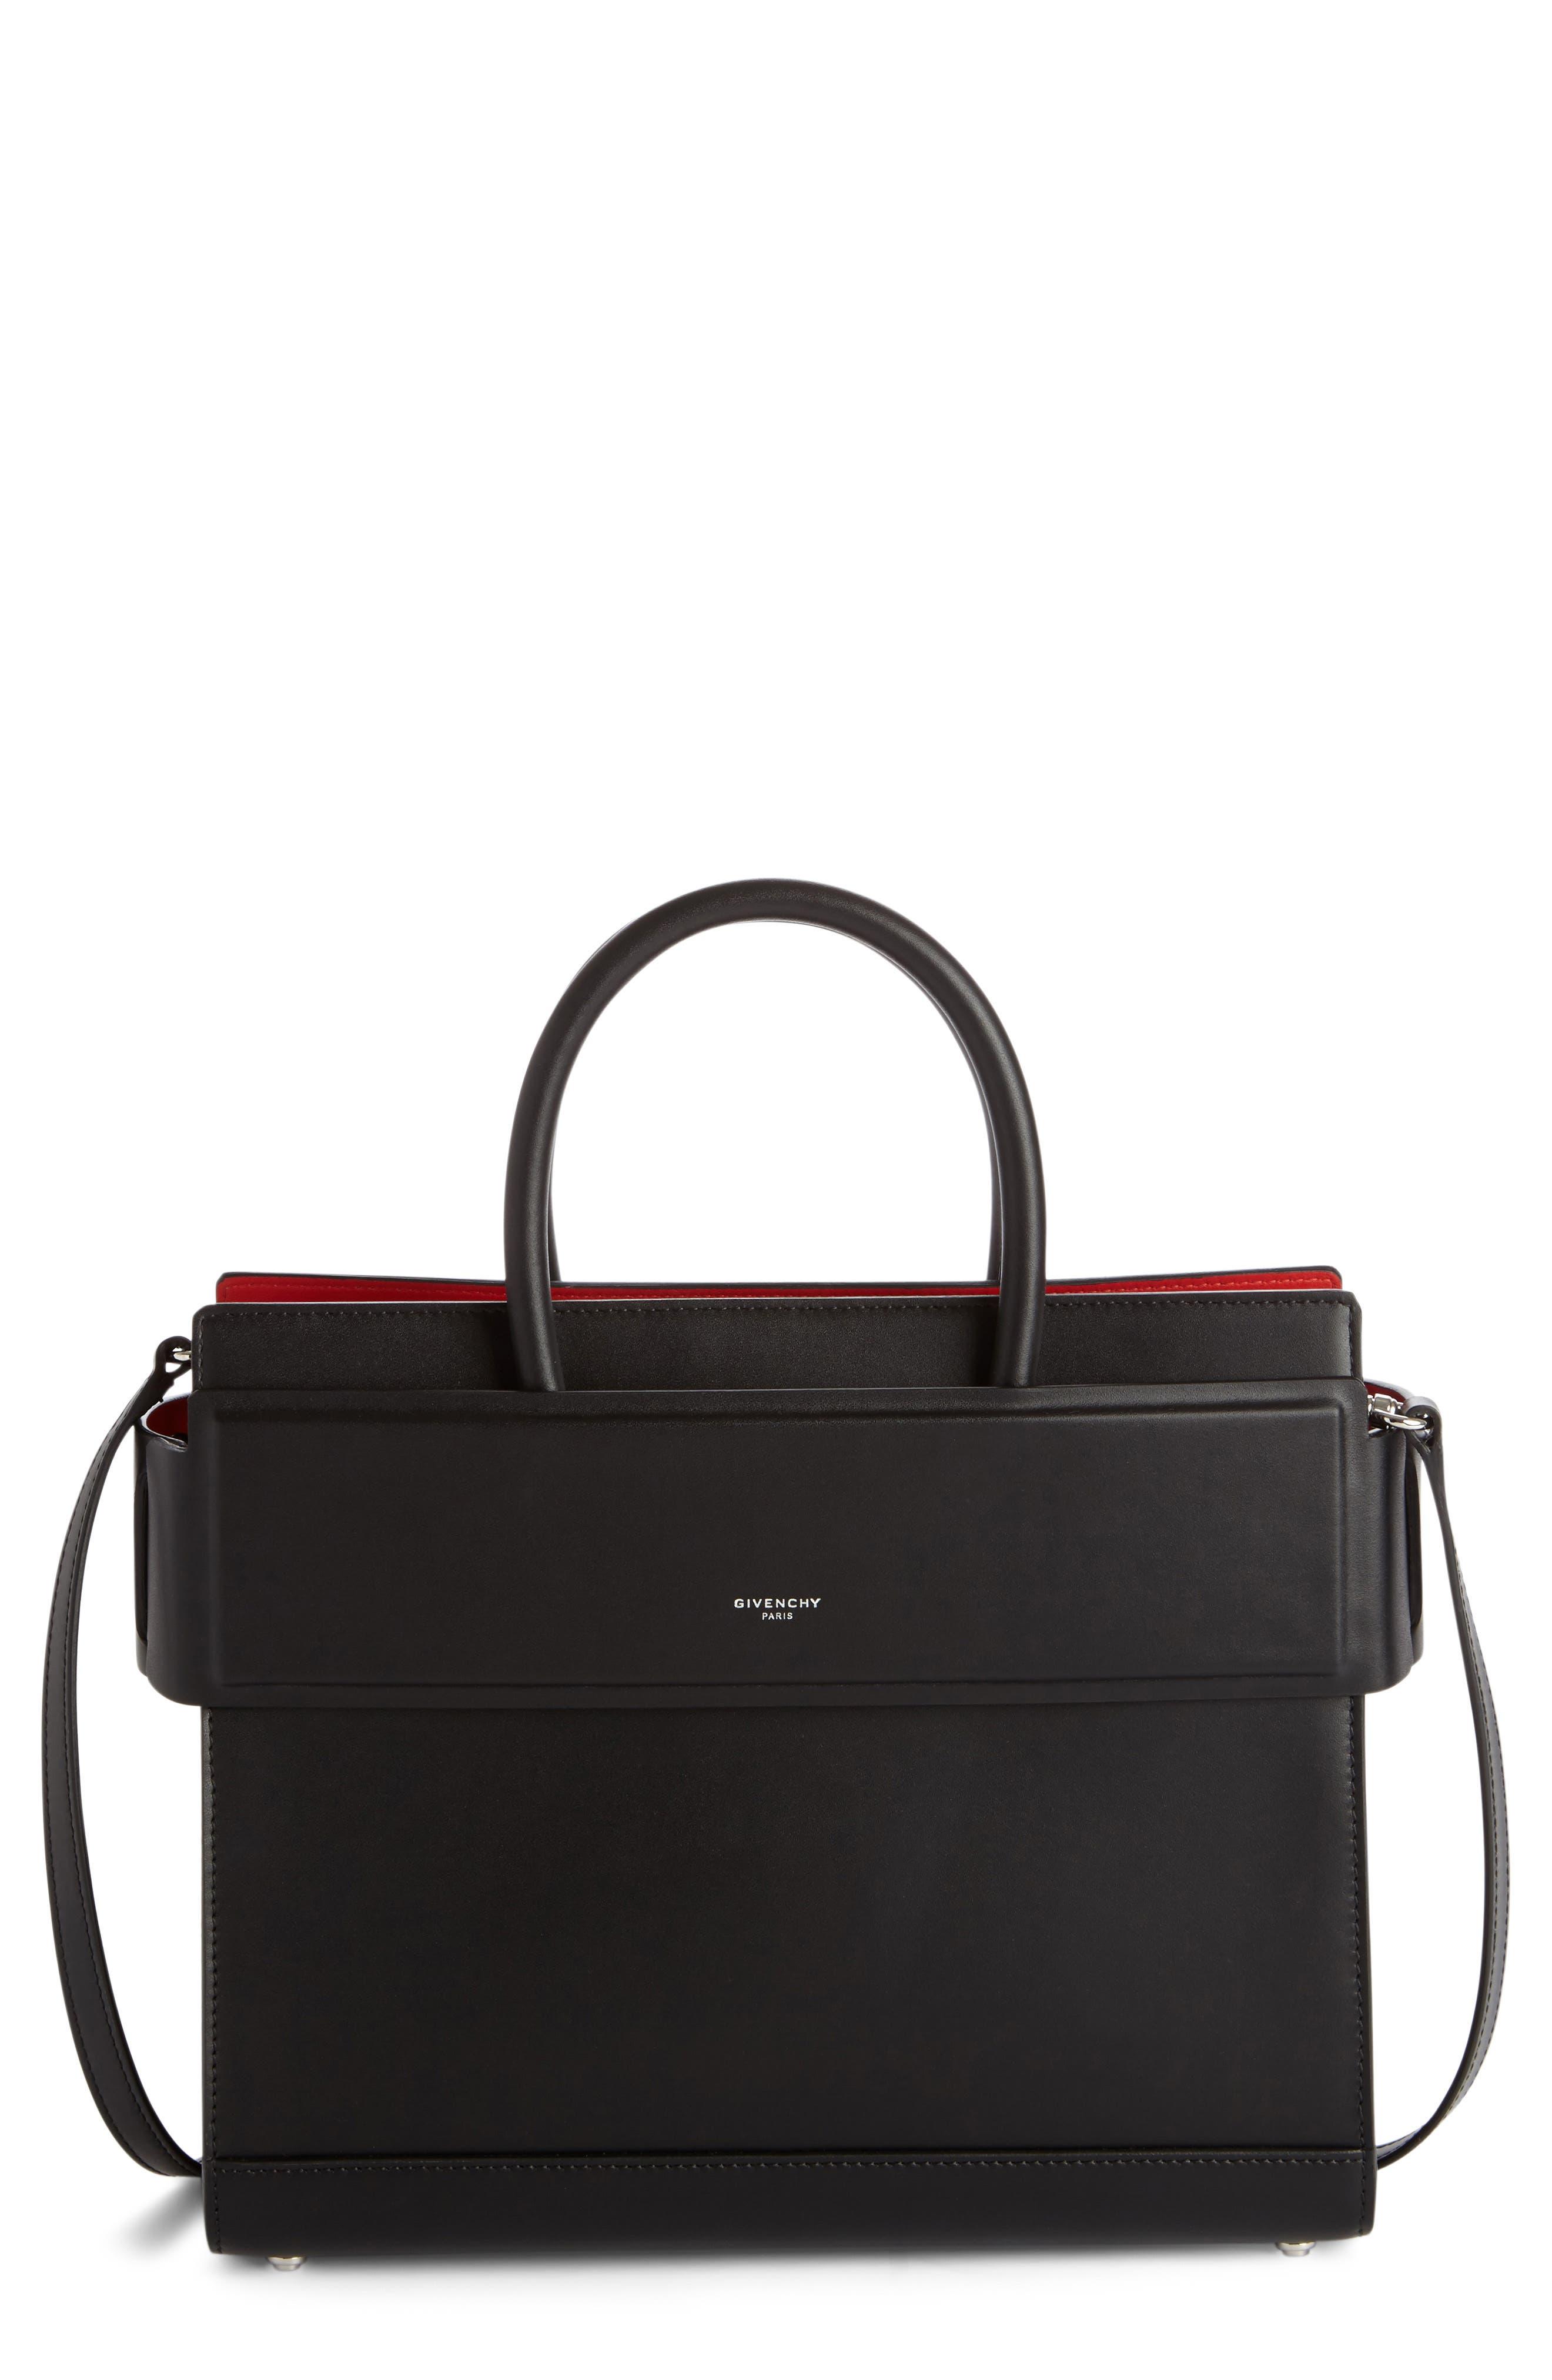 Main Image - Givenchy Small Horizon Calfskin Leather Tote